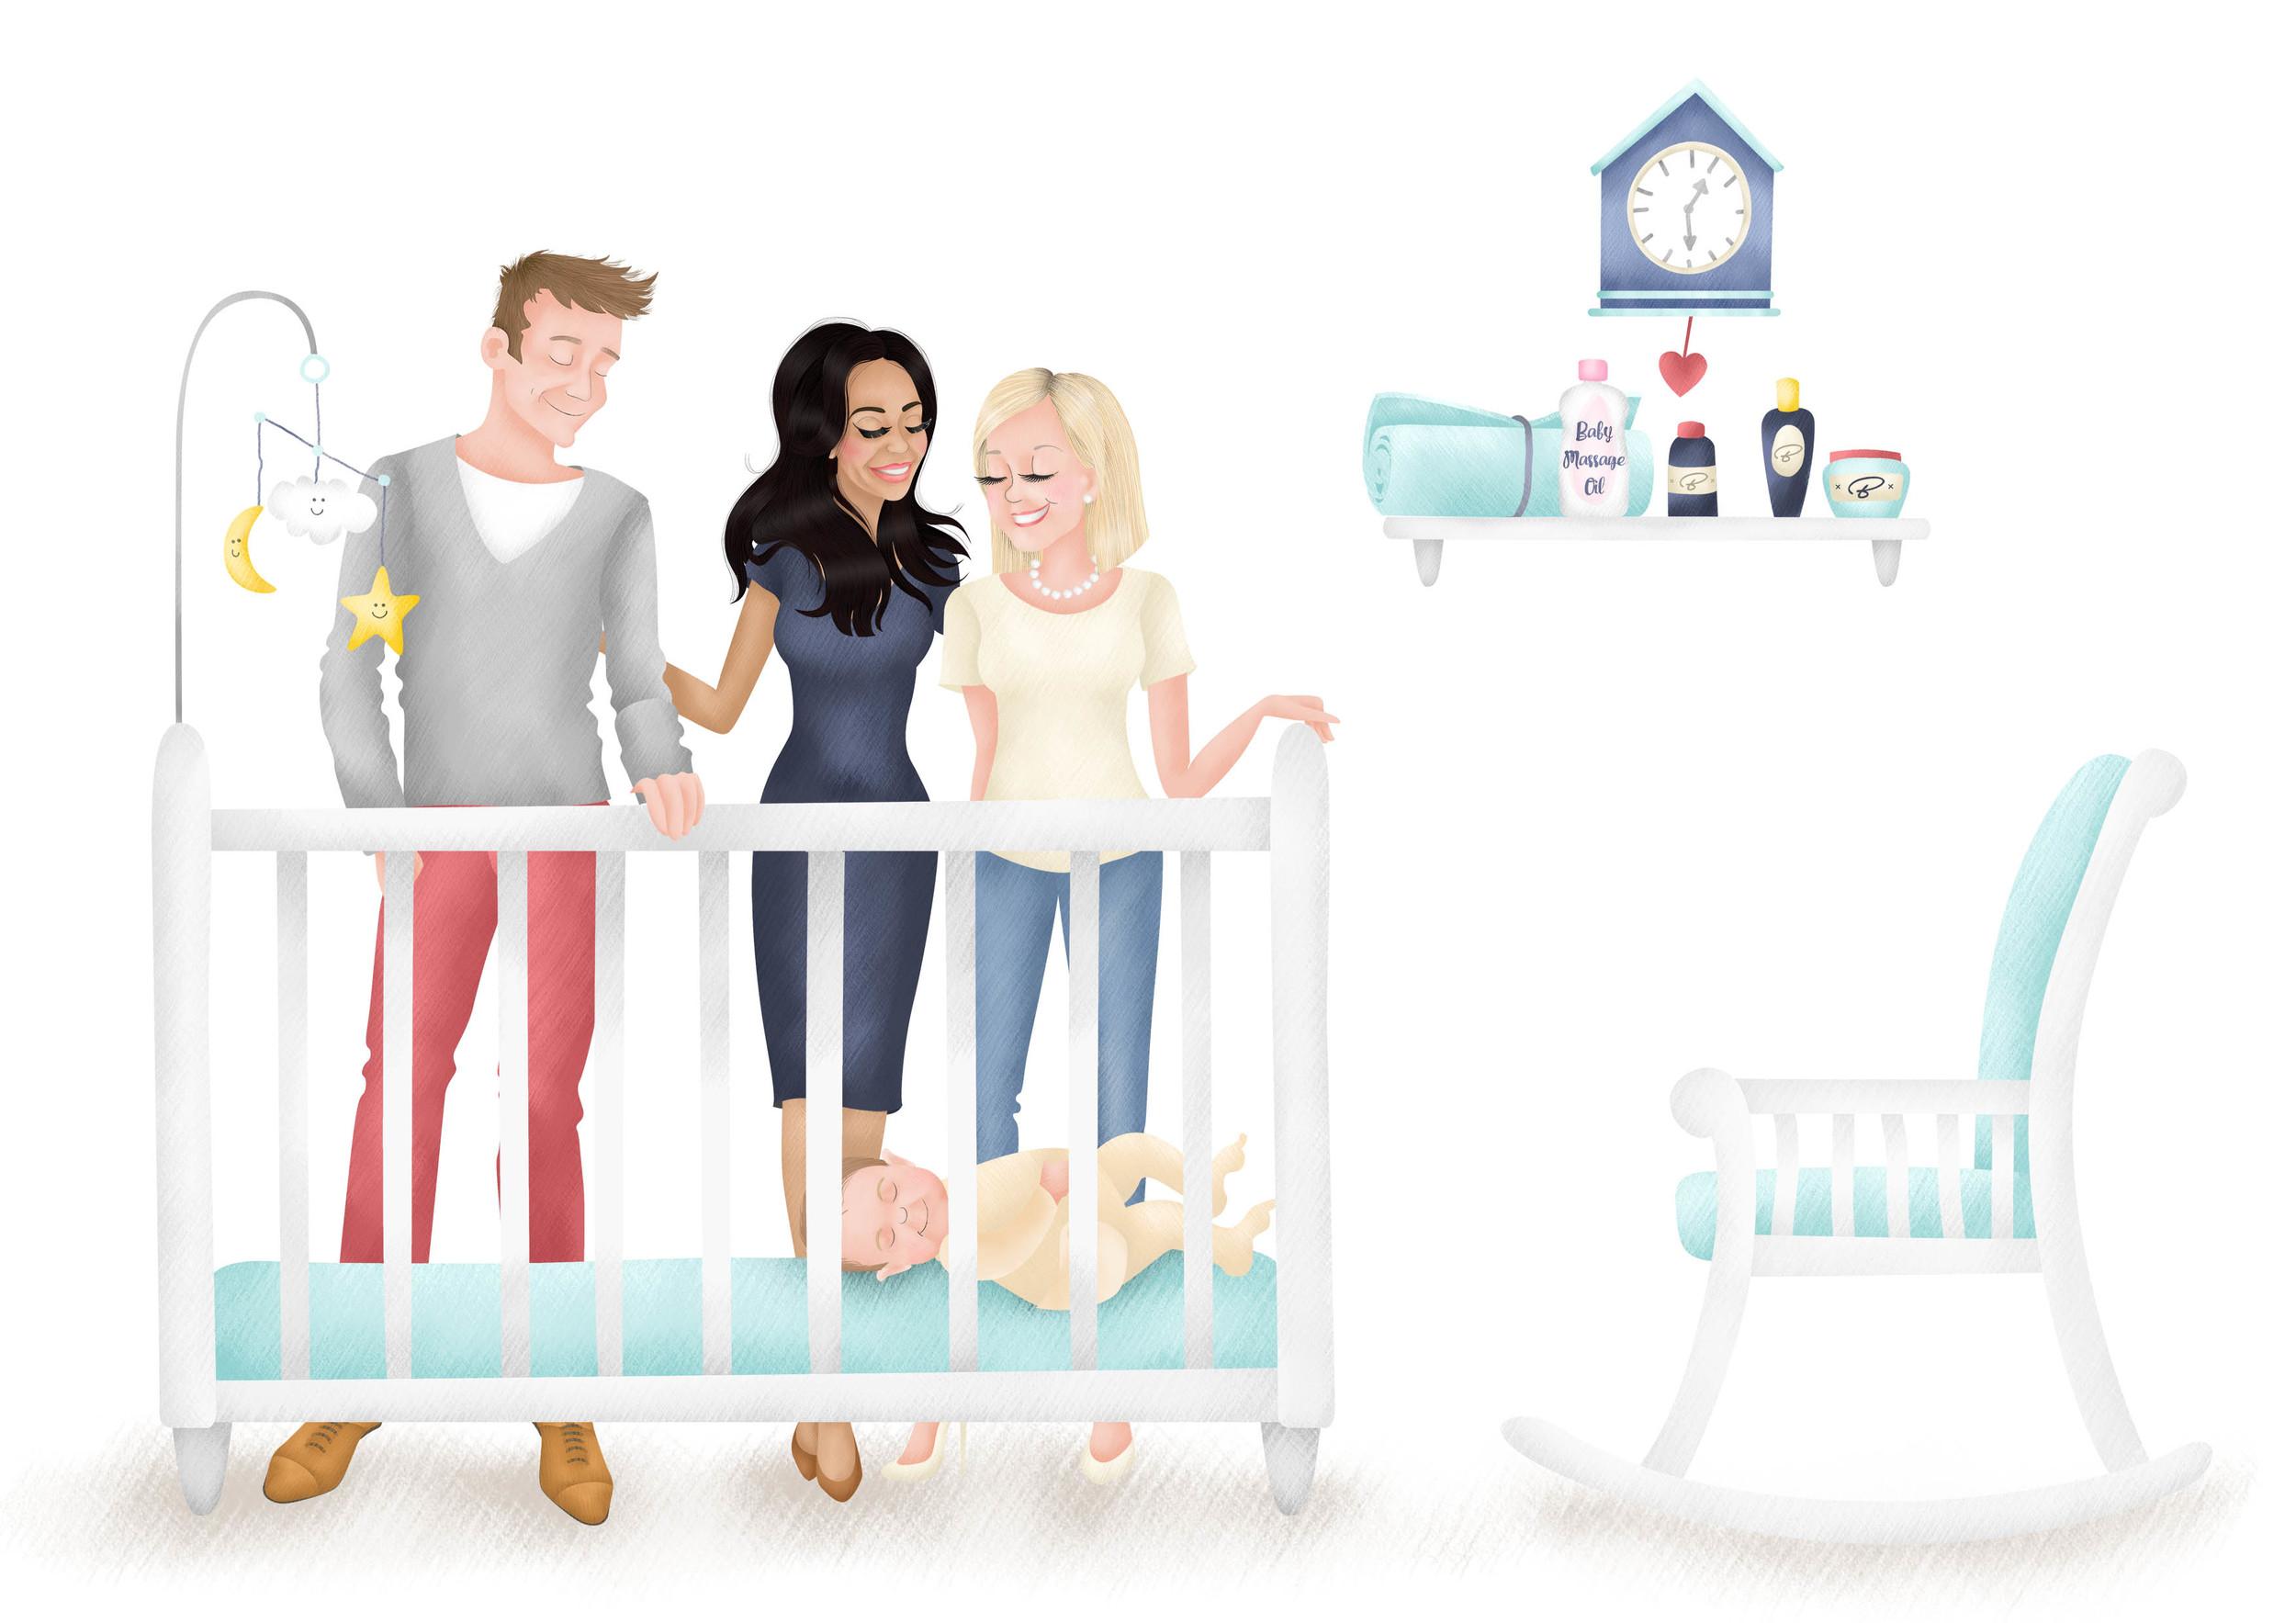 The Baby Aim - Concierge Illustration